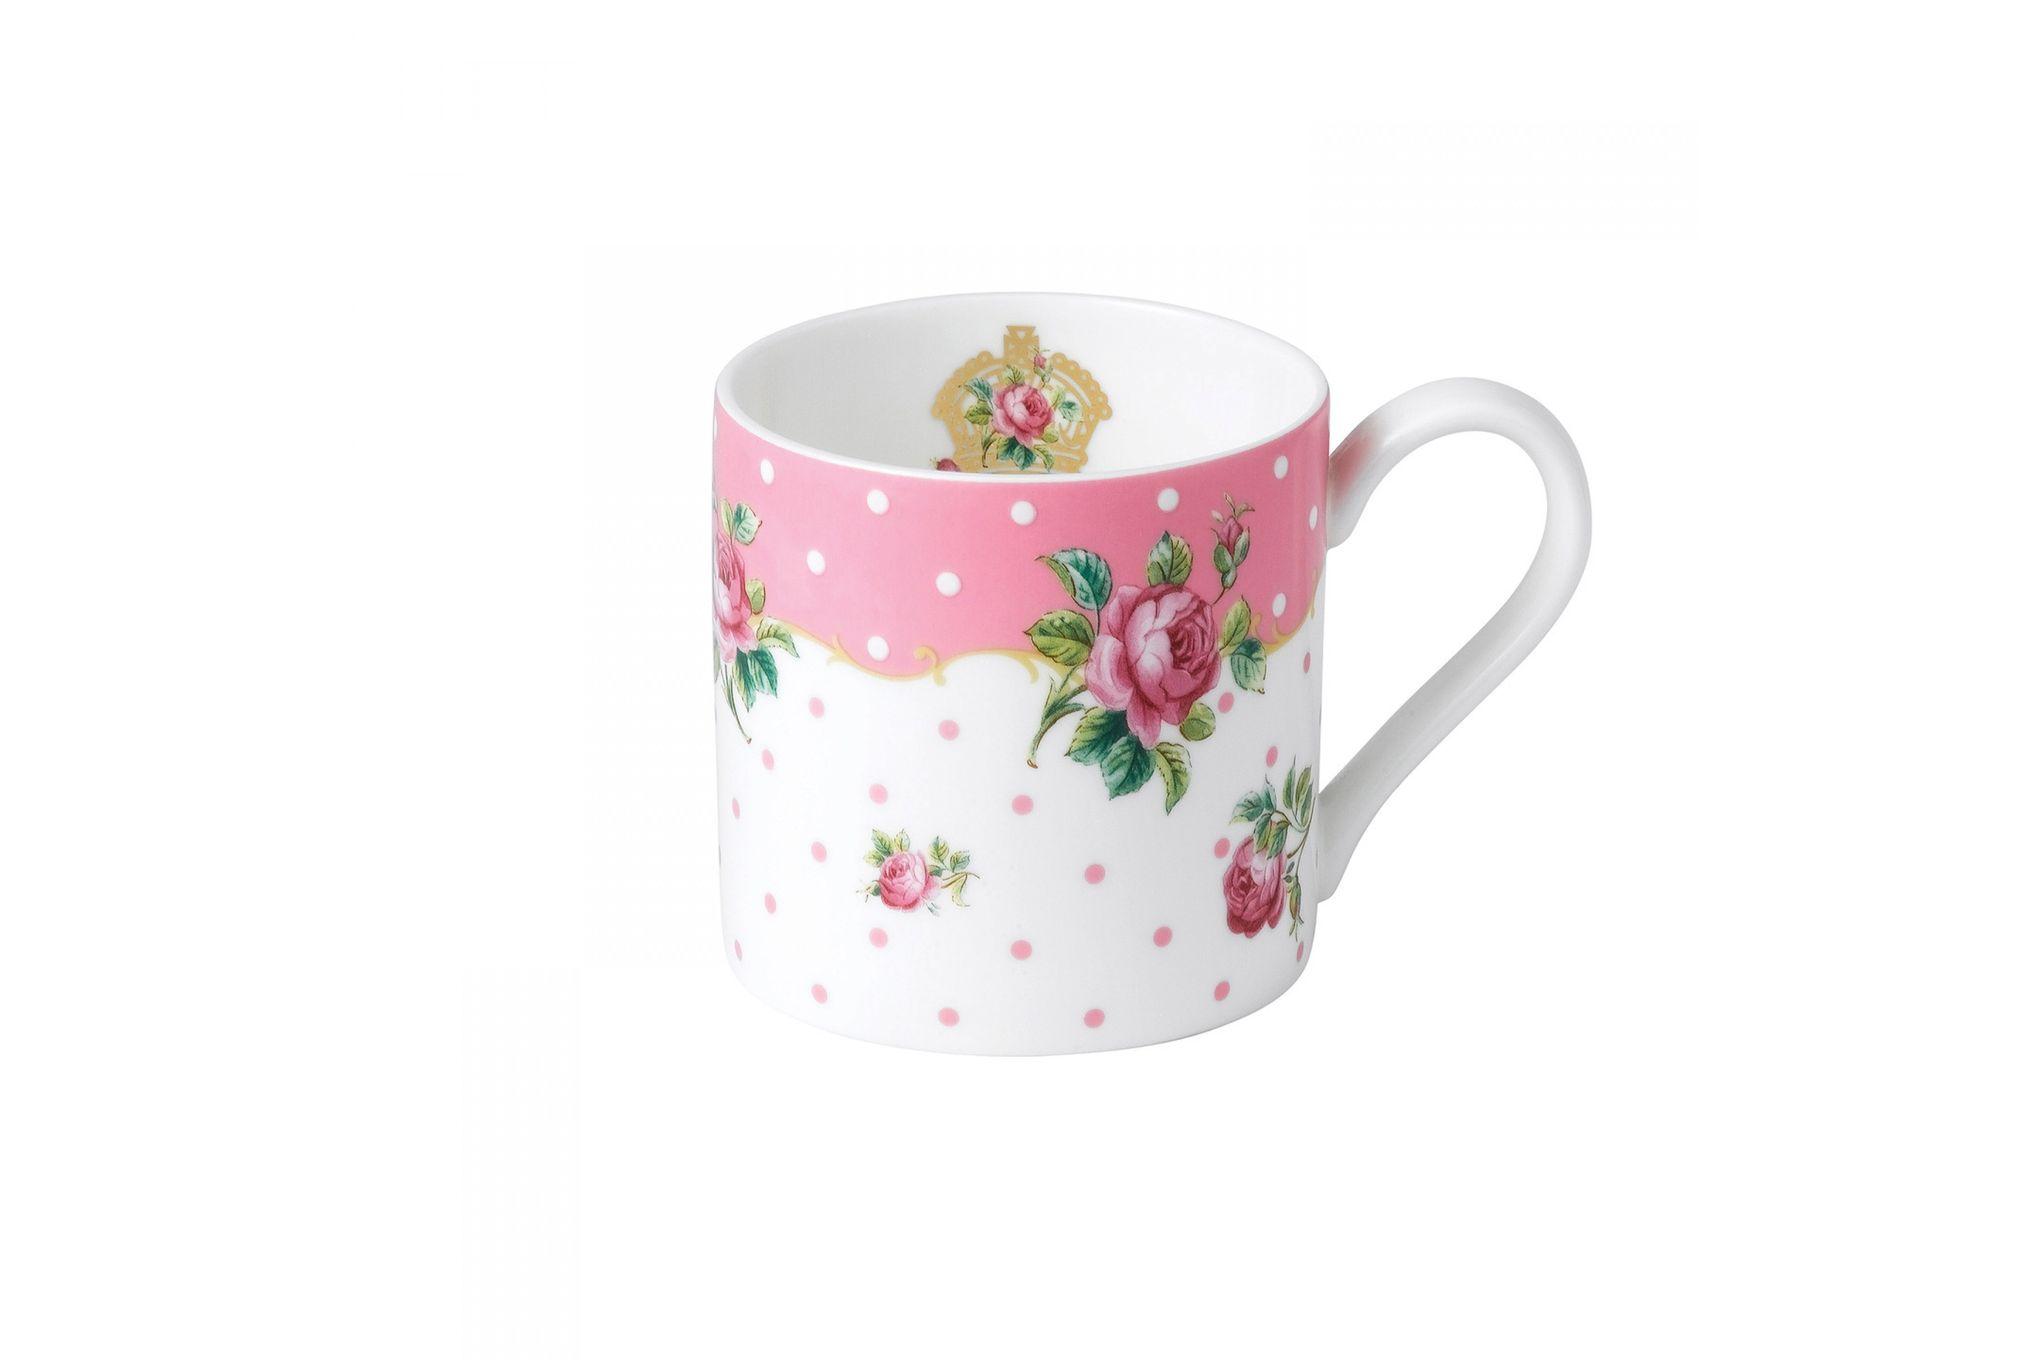 Royal Albert Cheeky Pink Mug Cheeky Pink - Modern Mug thumb 1